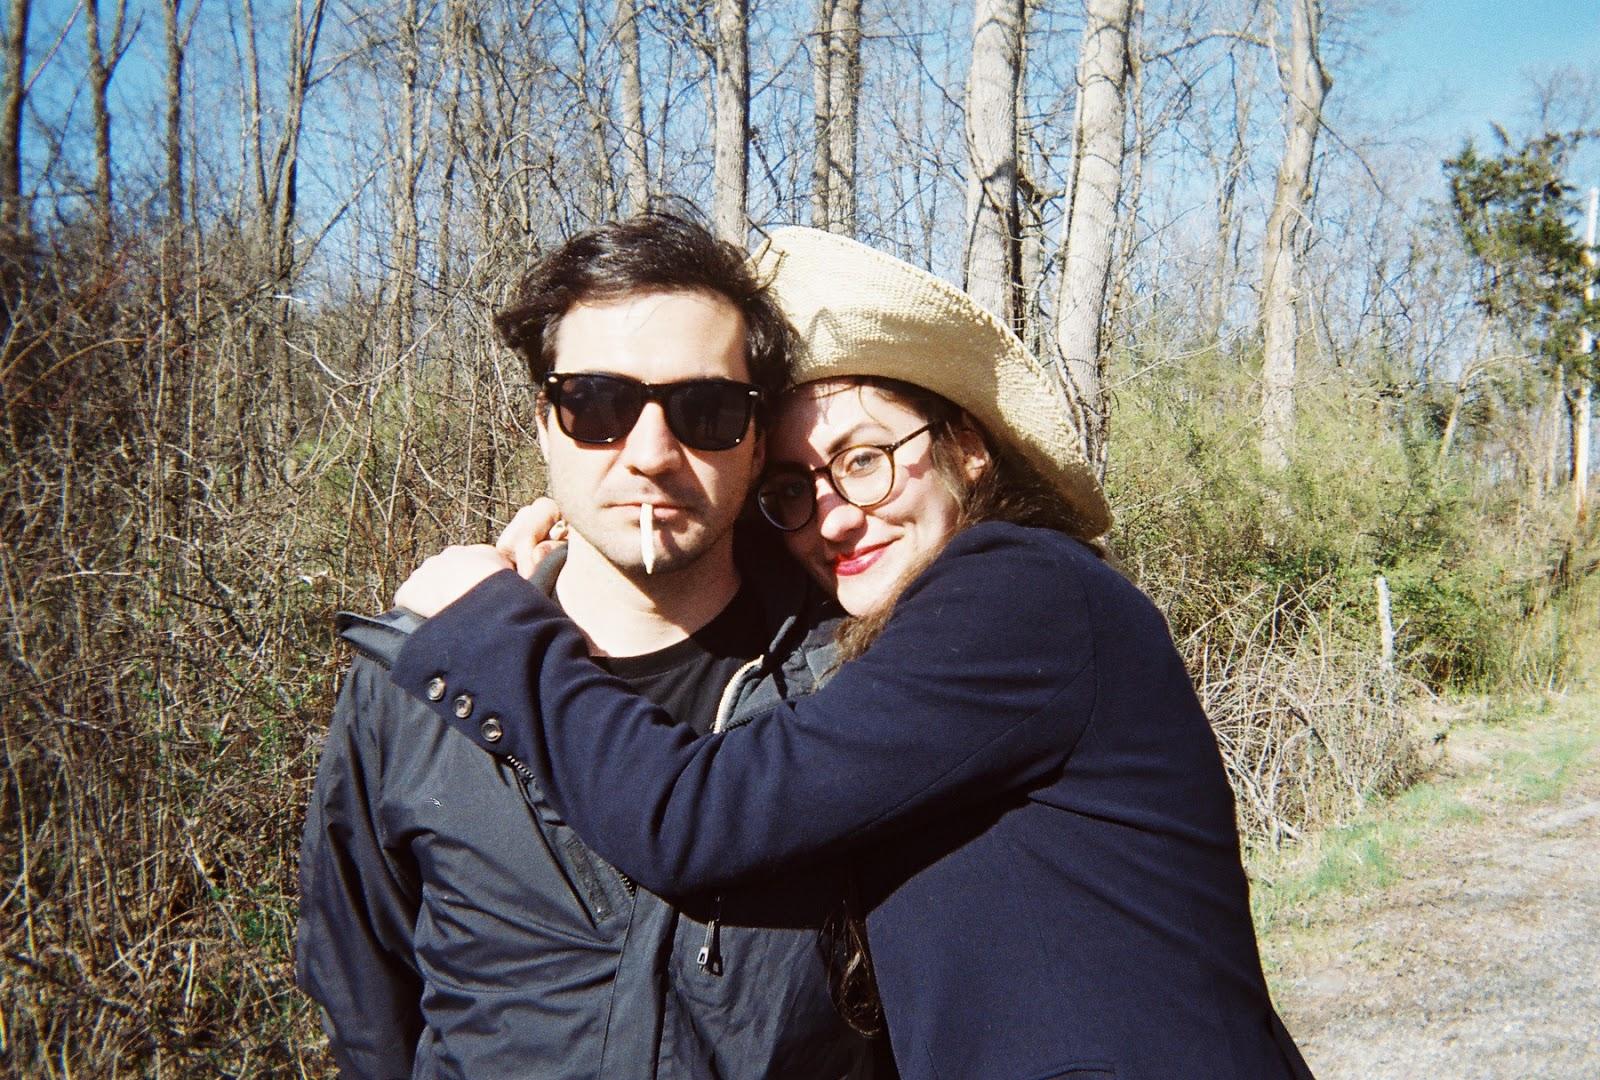 """RY AND TESSA,"" 2013, EMILY LUDWIG SHAFFER"